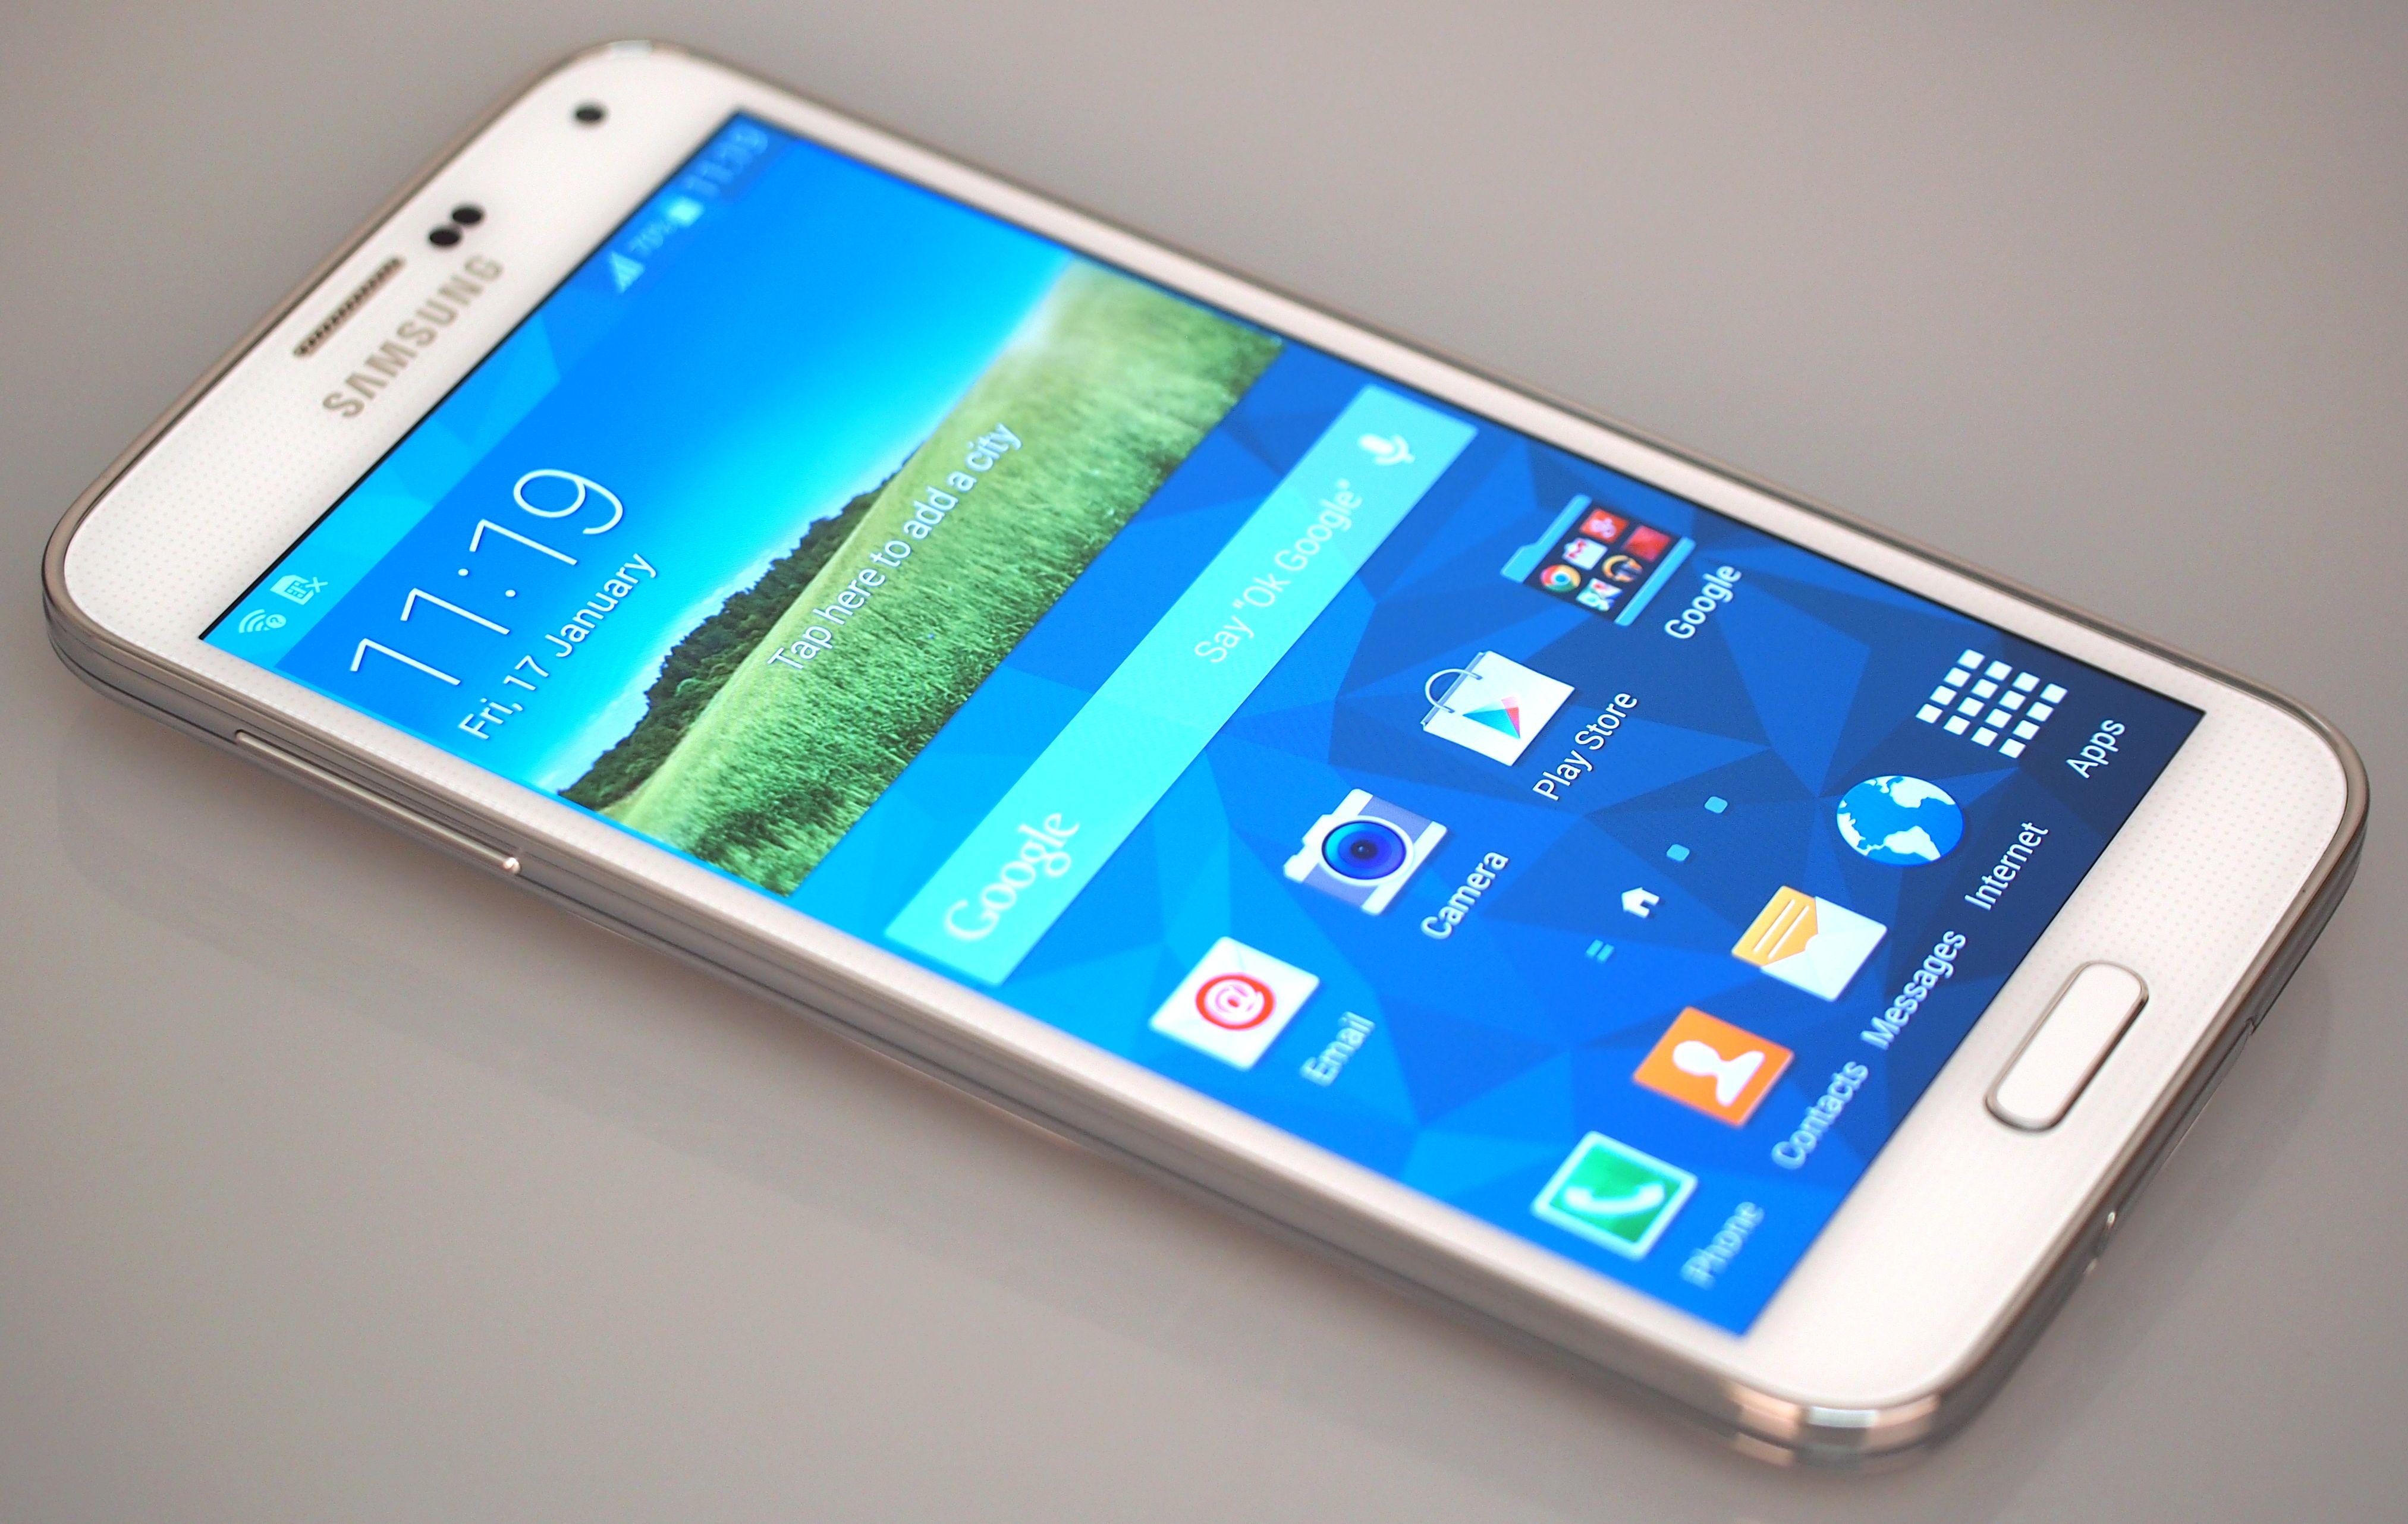 Clone Flash Stock Rom On Samsung Galaxy S5 Mini We Are Going To Flash Stock Rom On Samsung Galaxy S5 Mini Clone In 2020 Samsung Galaxy S5 Galaxy S5 Samsung Galaxy